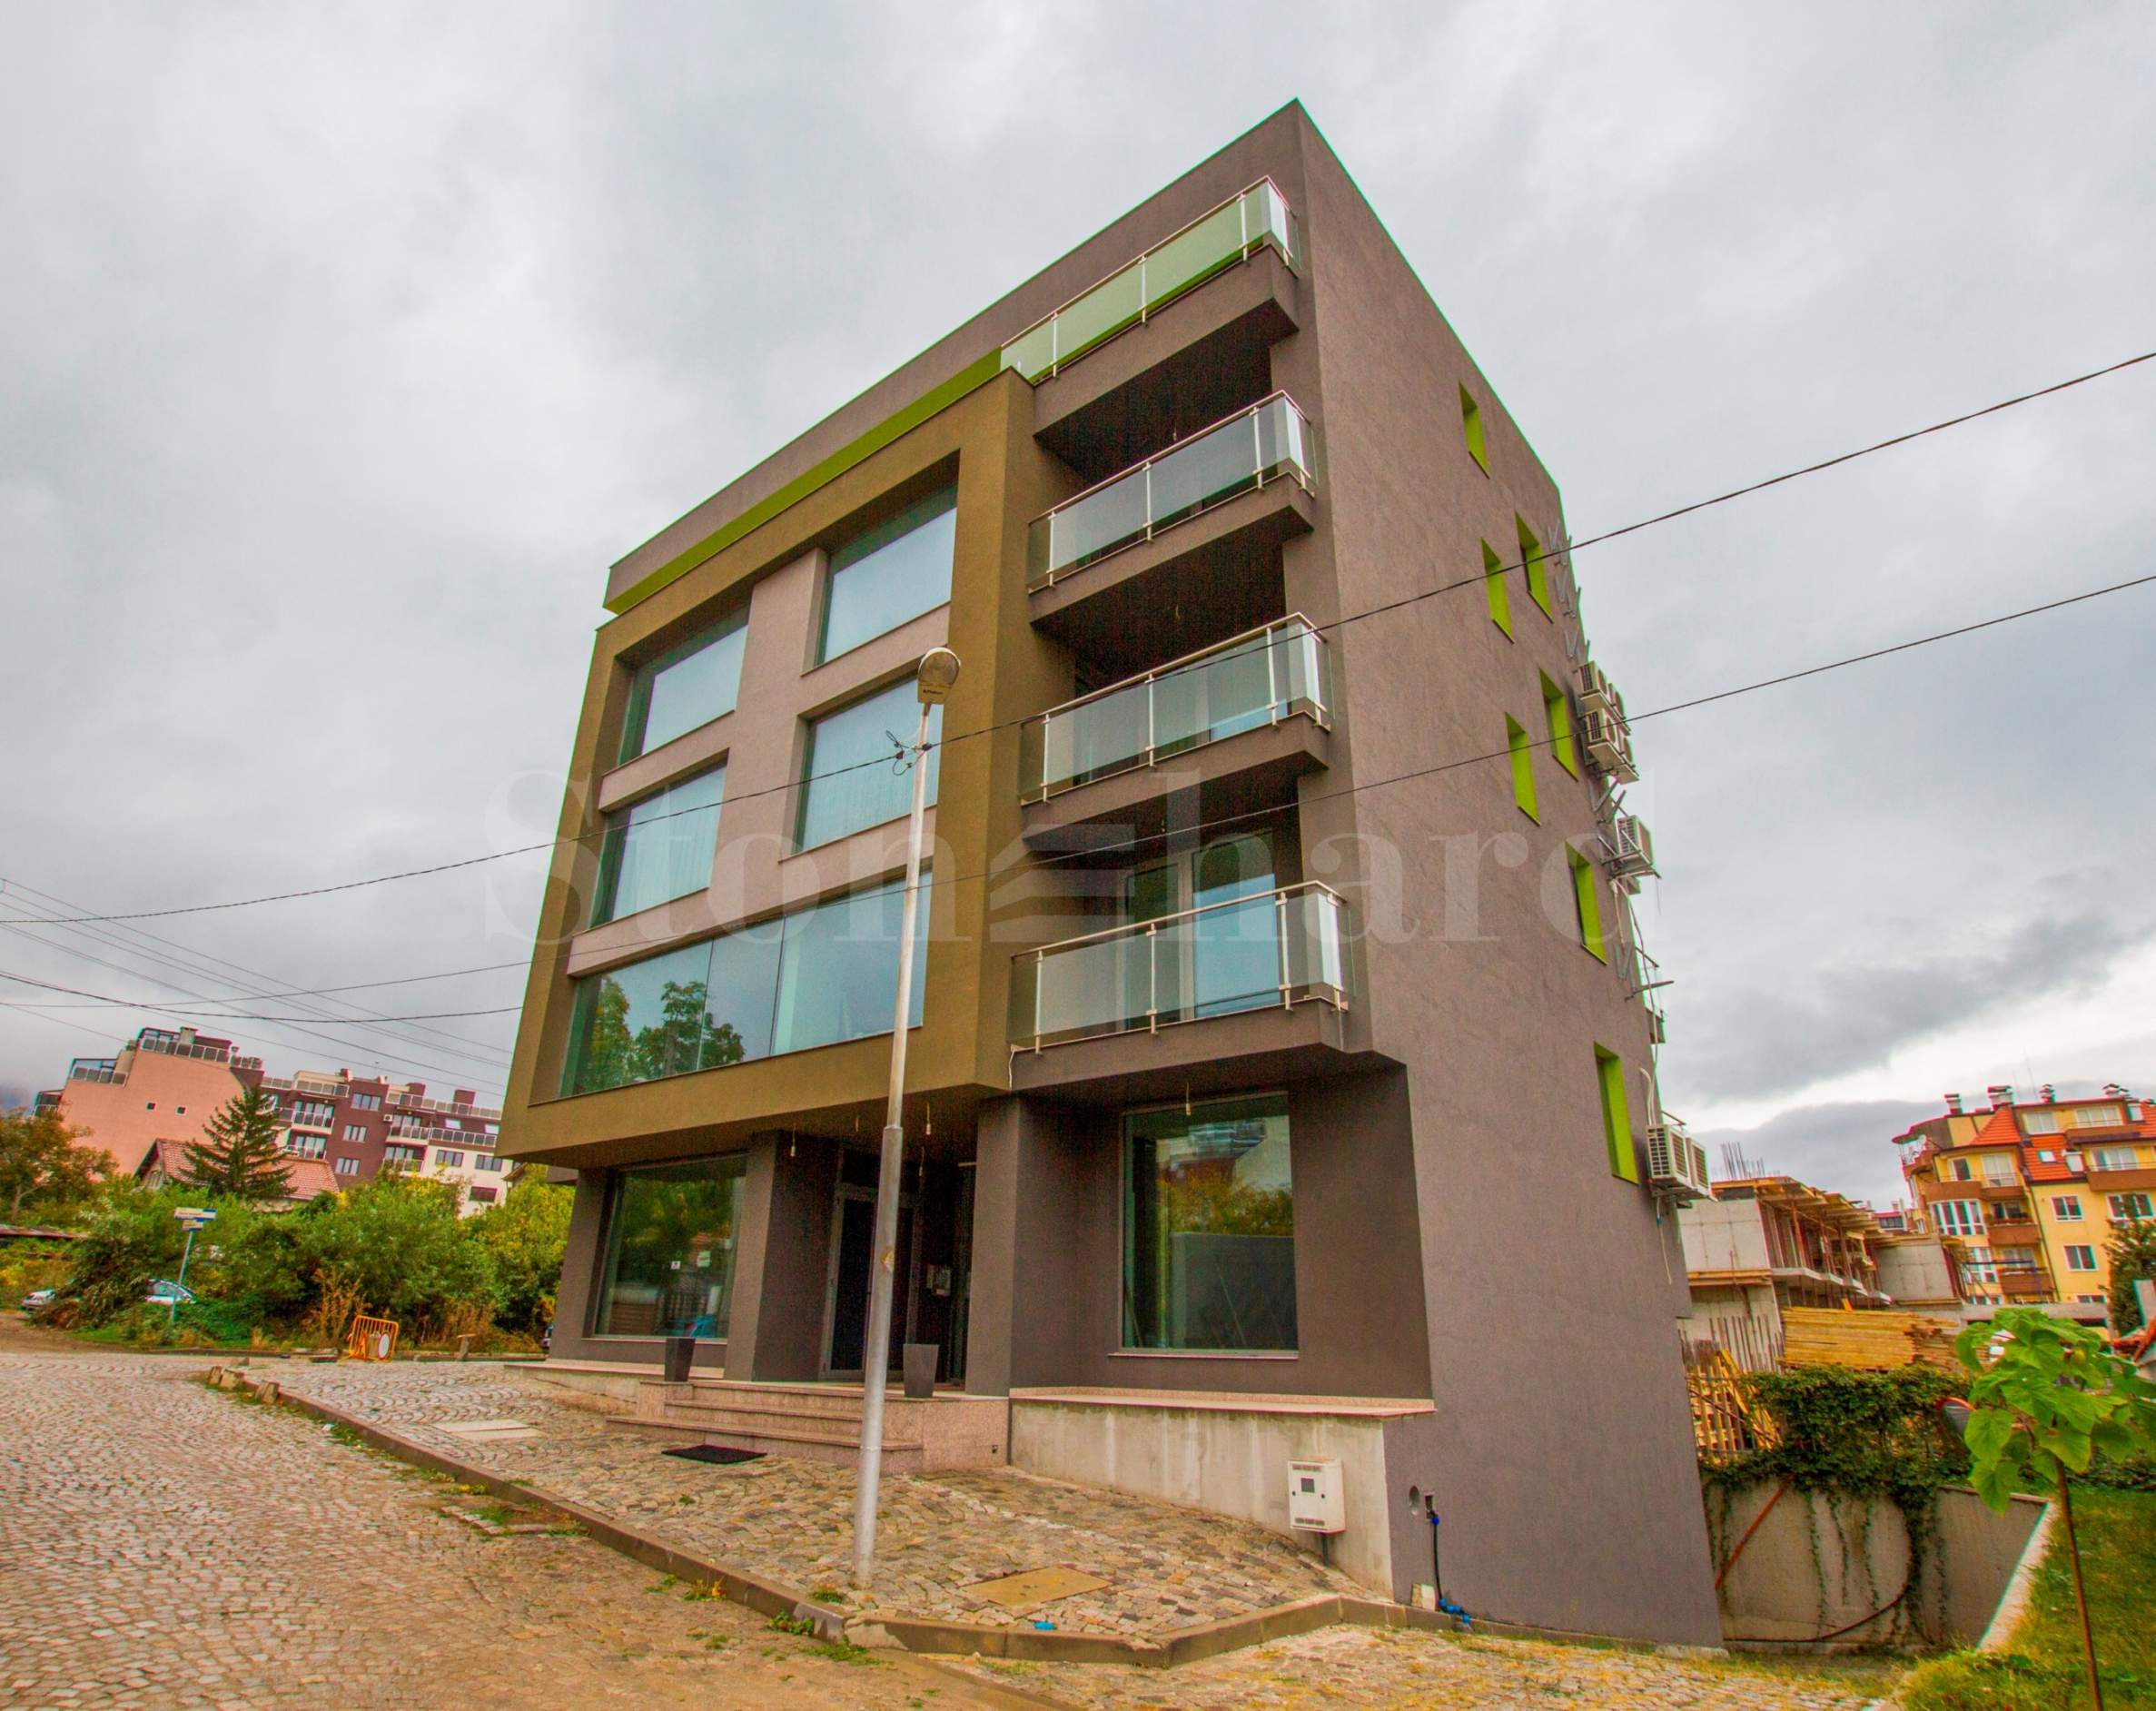 Самостоятелна сграда с жилища и офиси, с подземен гараж1 - Stonehard